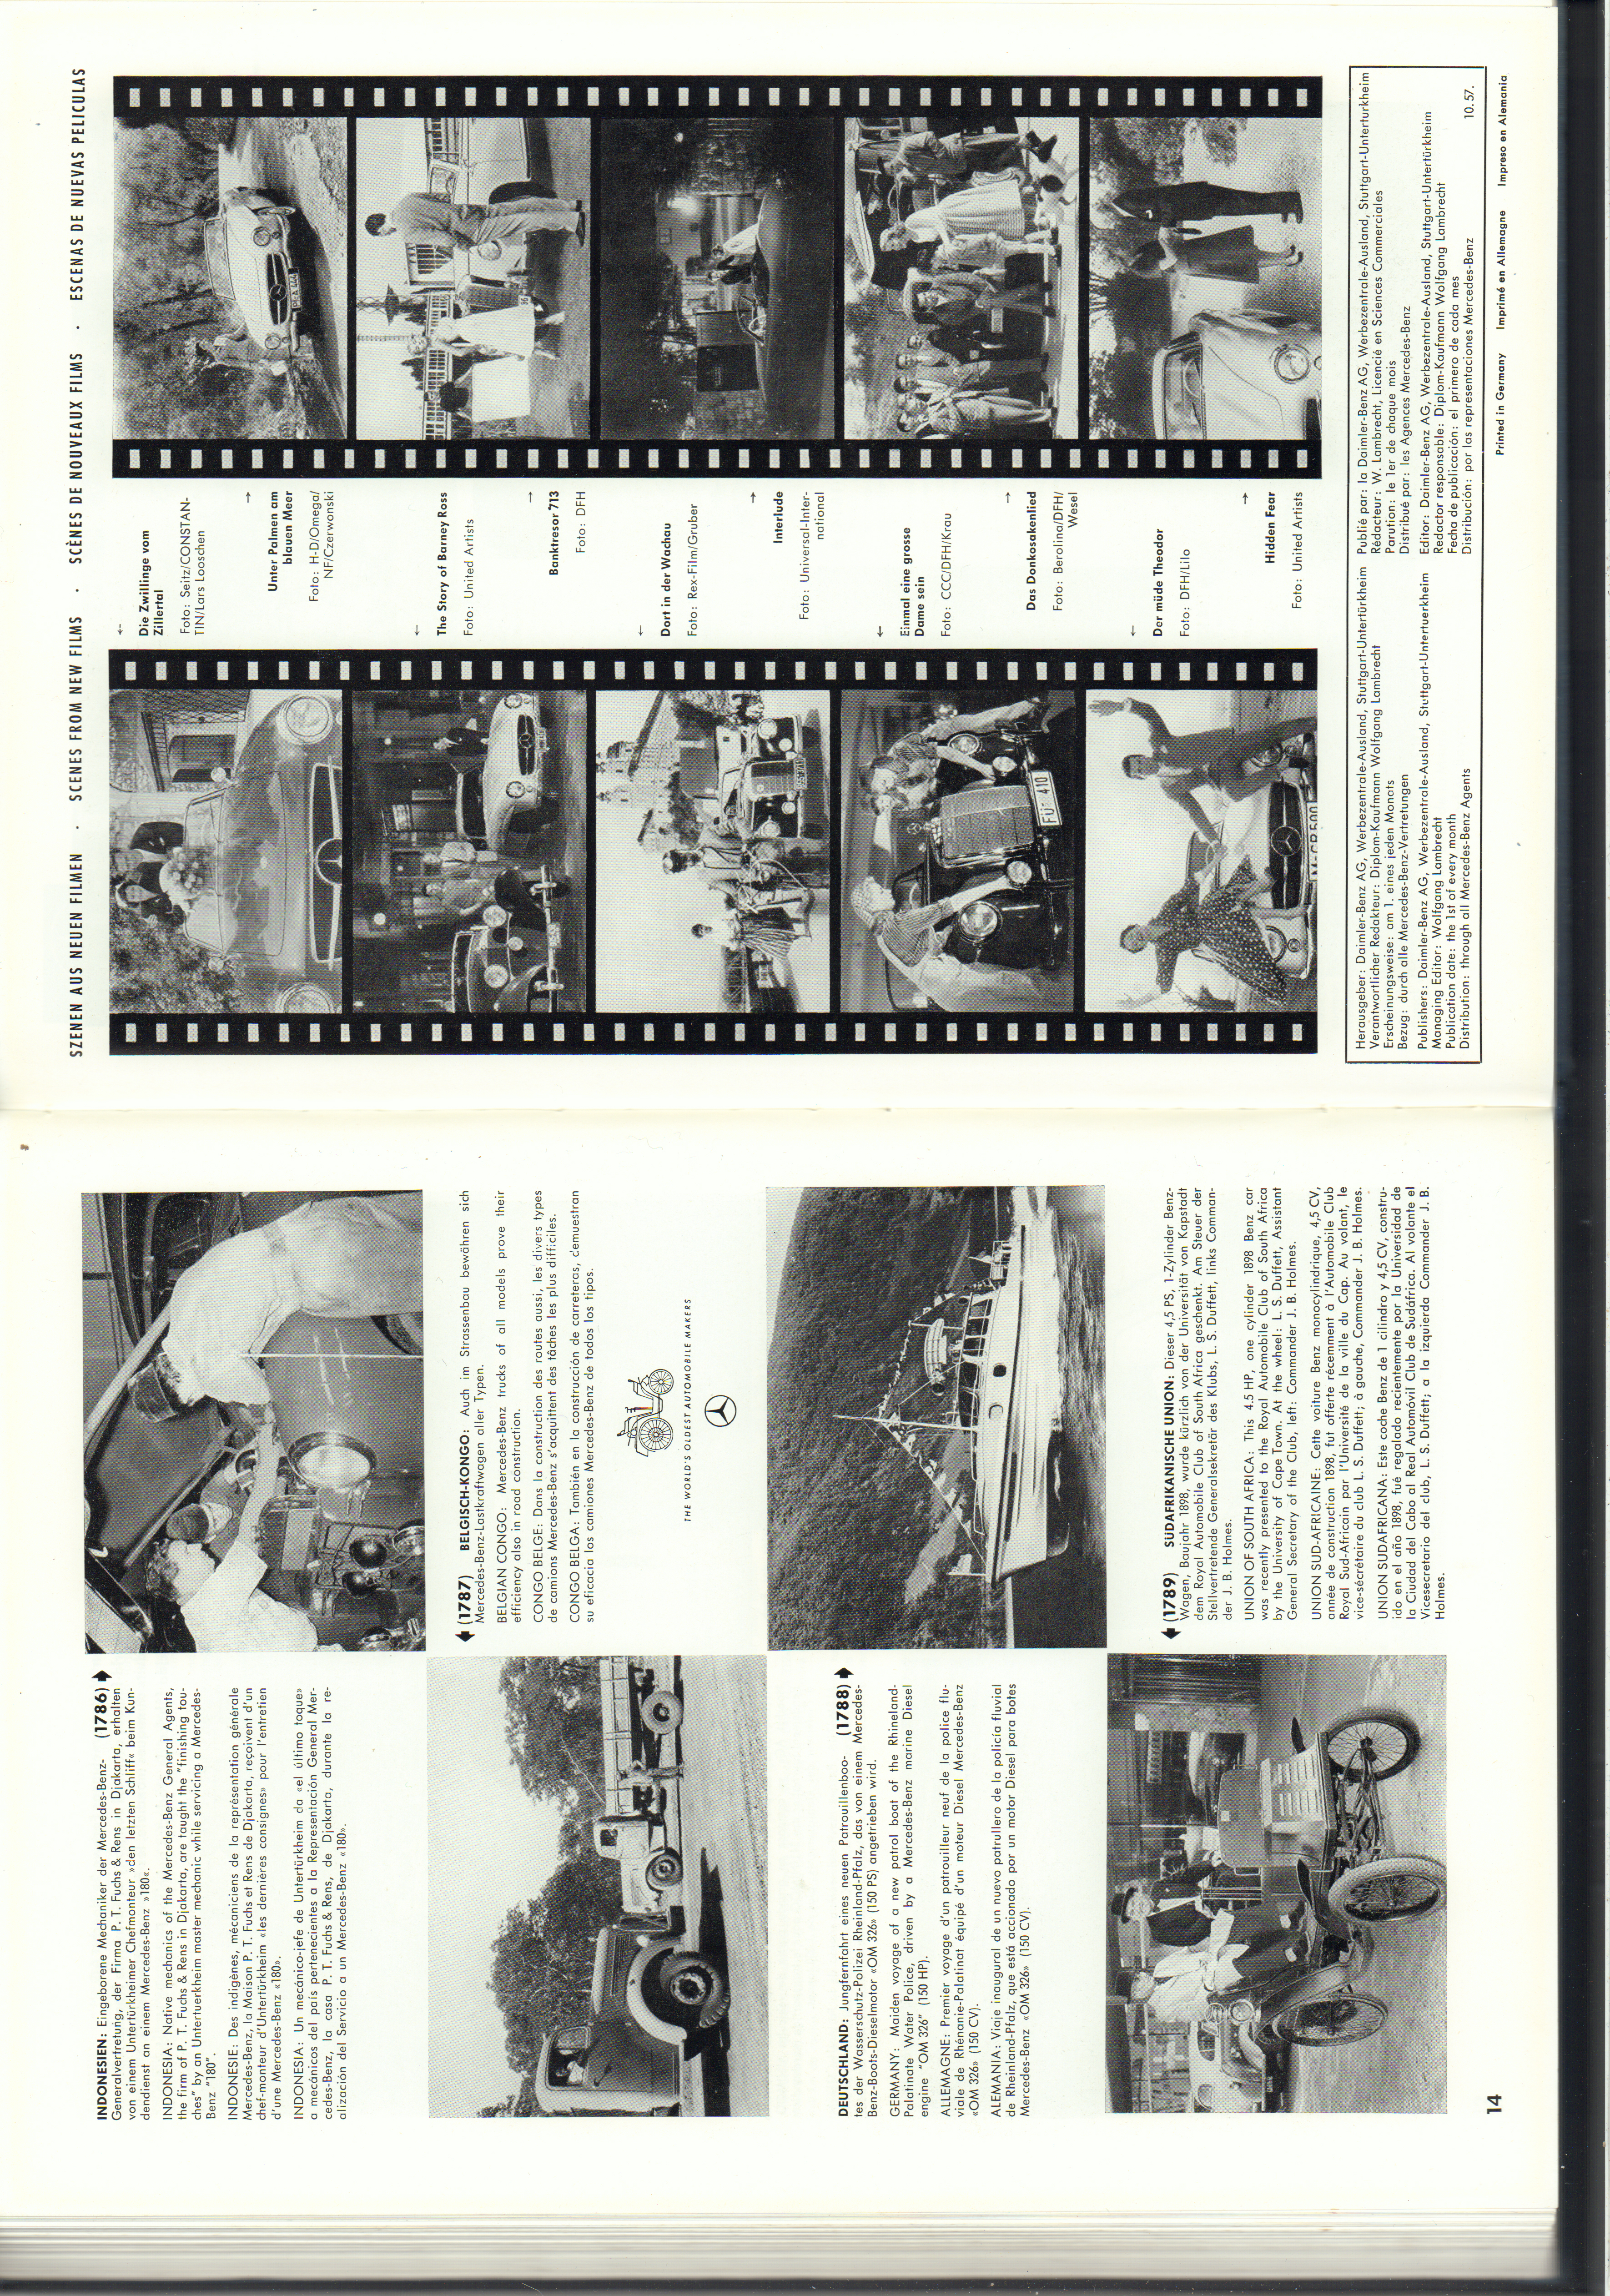 (REVISTA): Periódico In aller welt n.º 14 - Mercedes-Benz no mundo - 1957 - multilingue 008